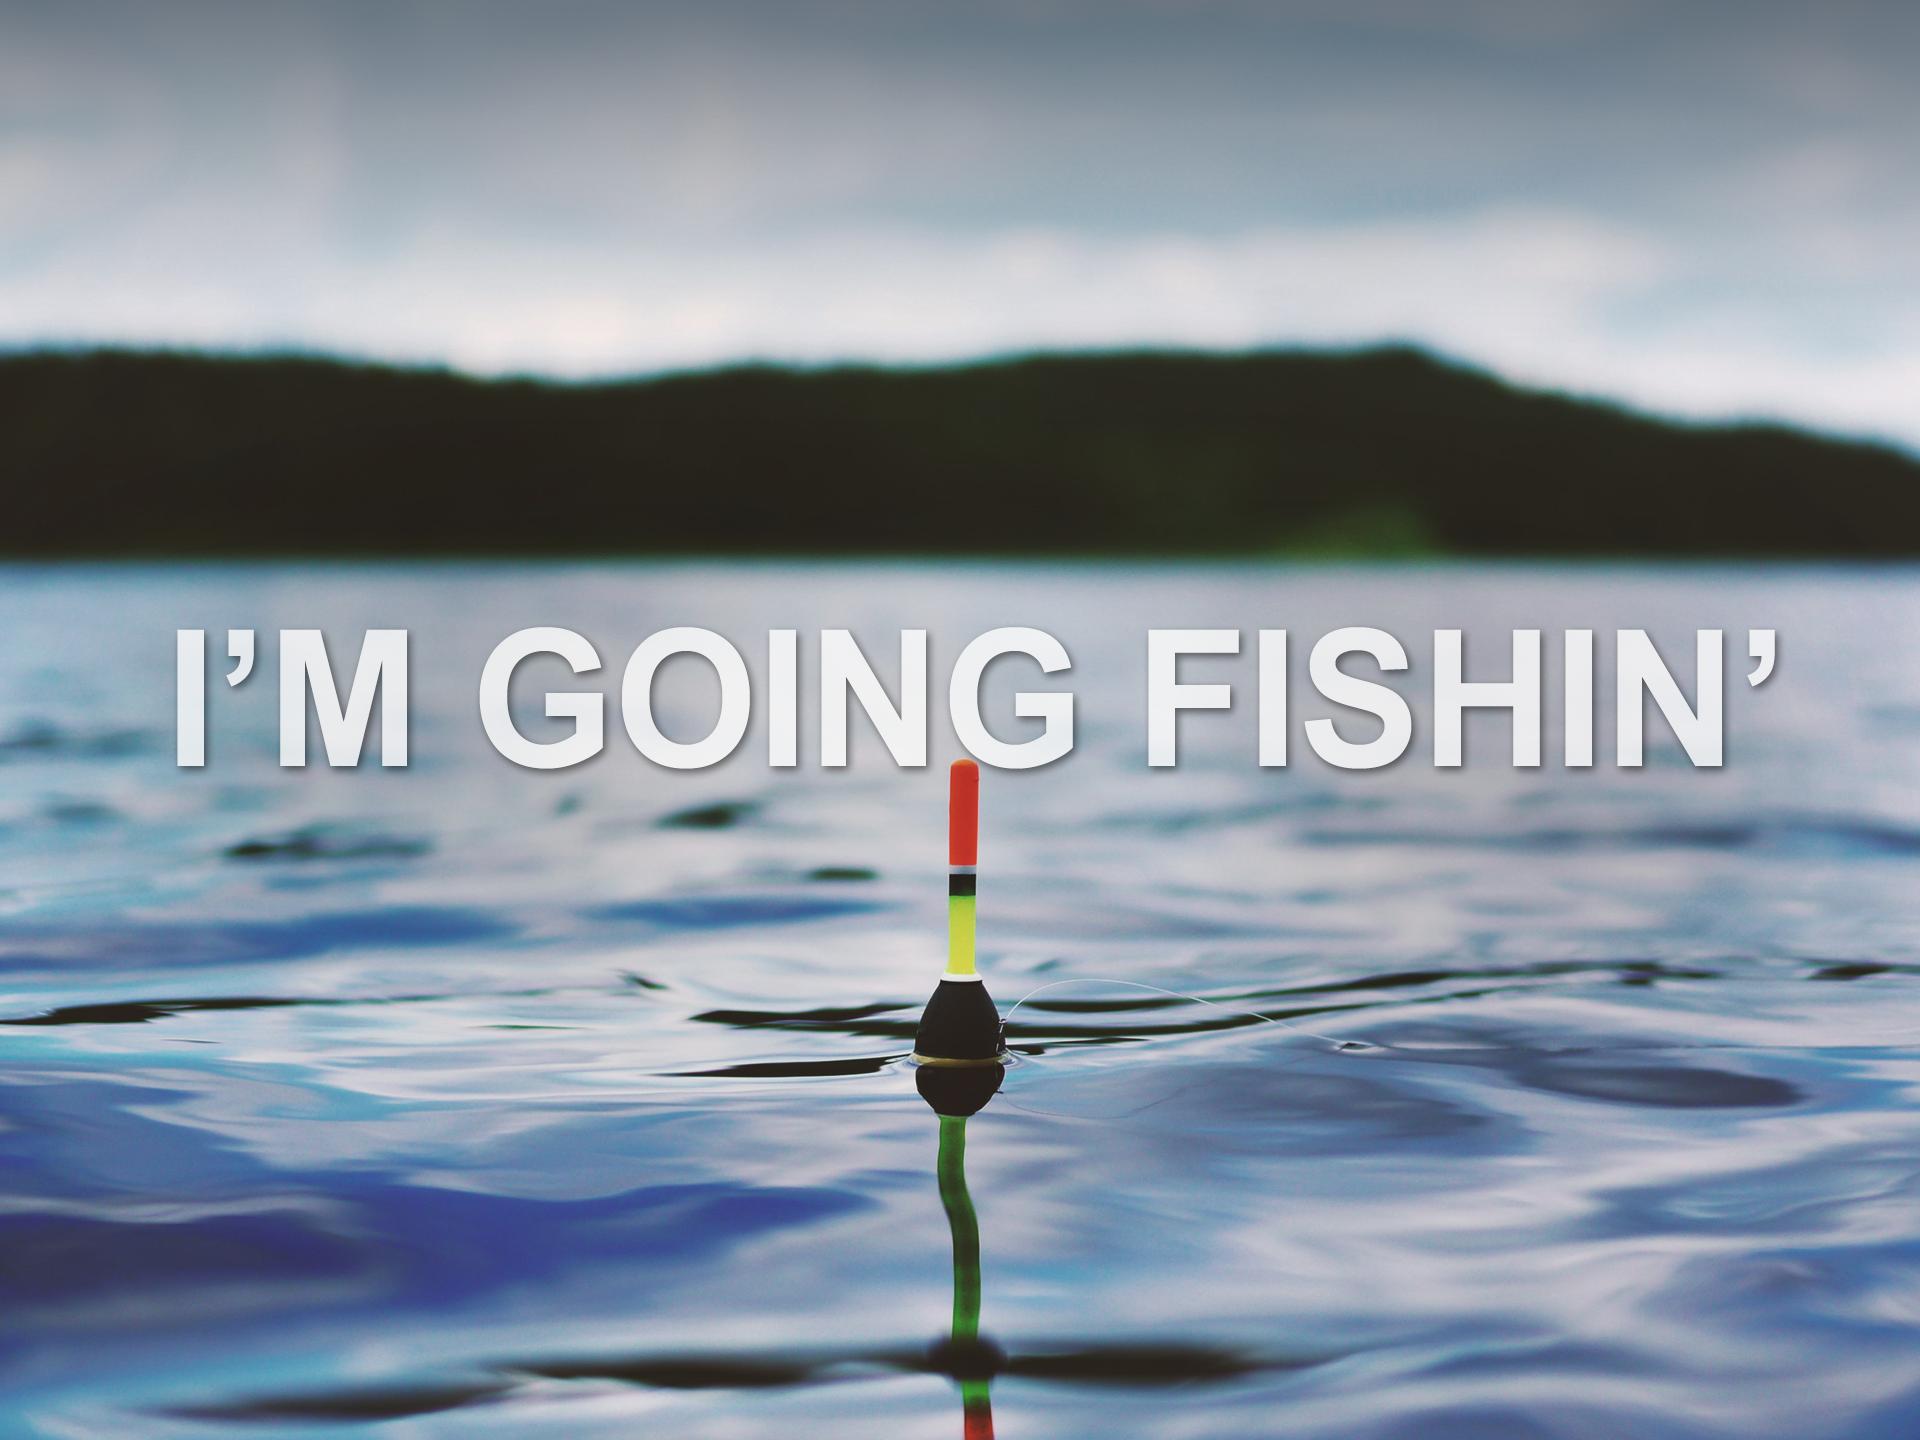 050519 im going fishin.png